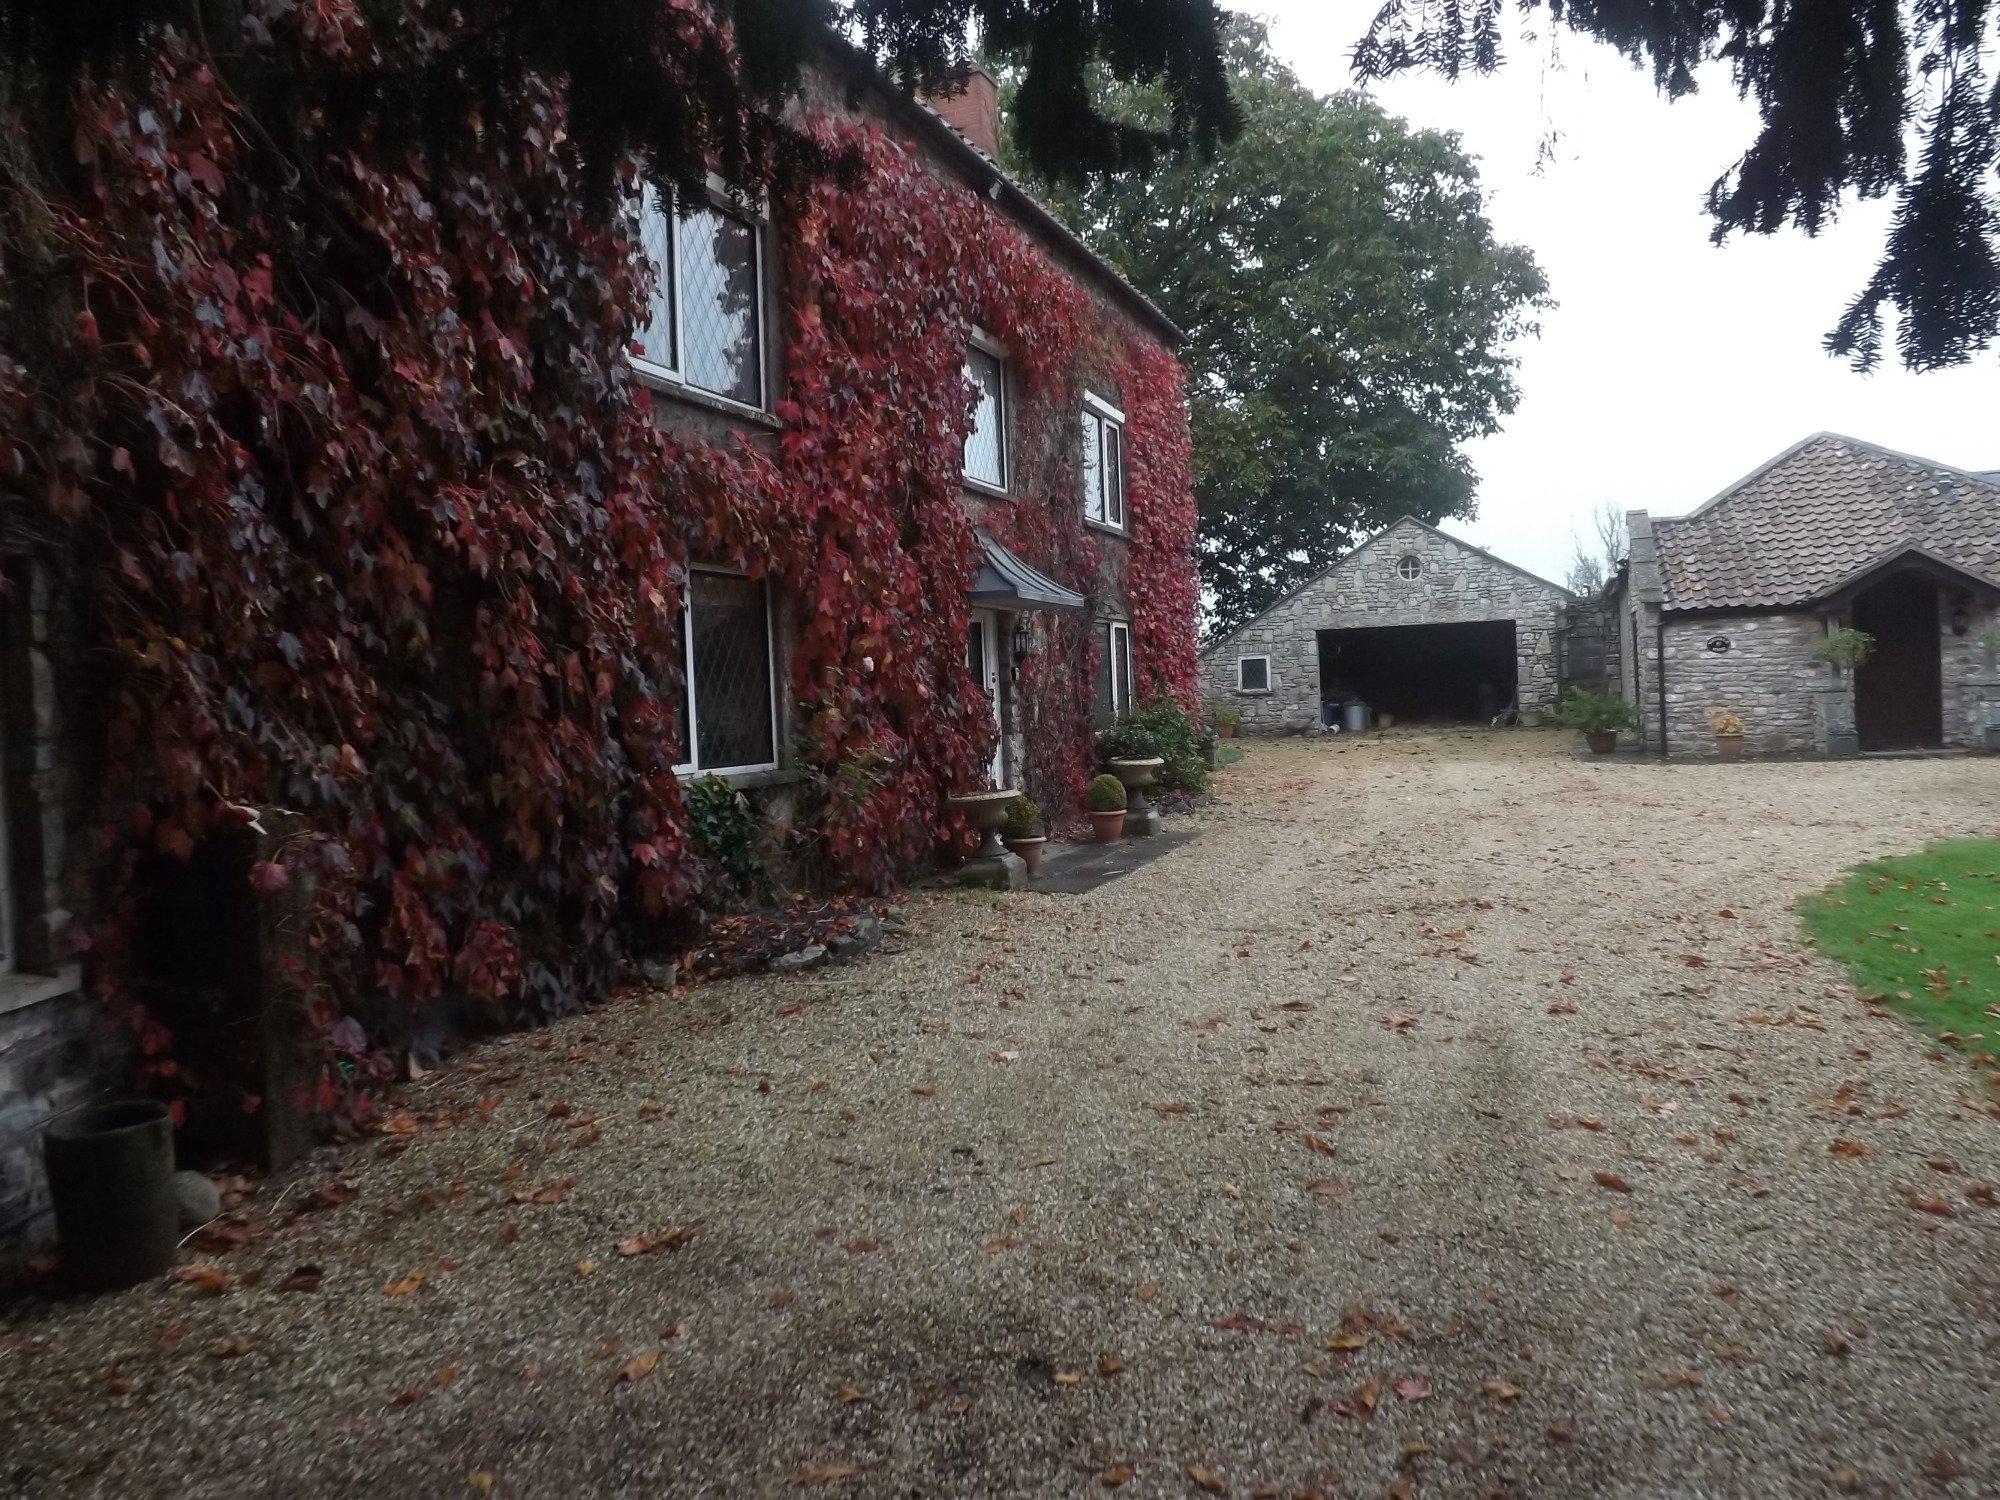 Islington Farm Bed & Breakast